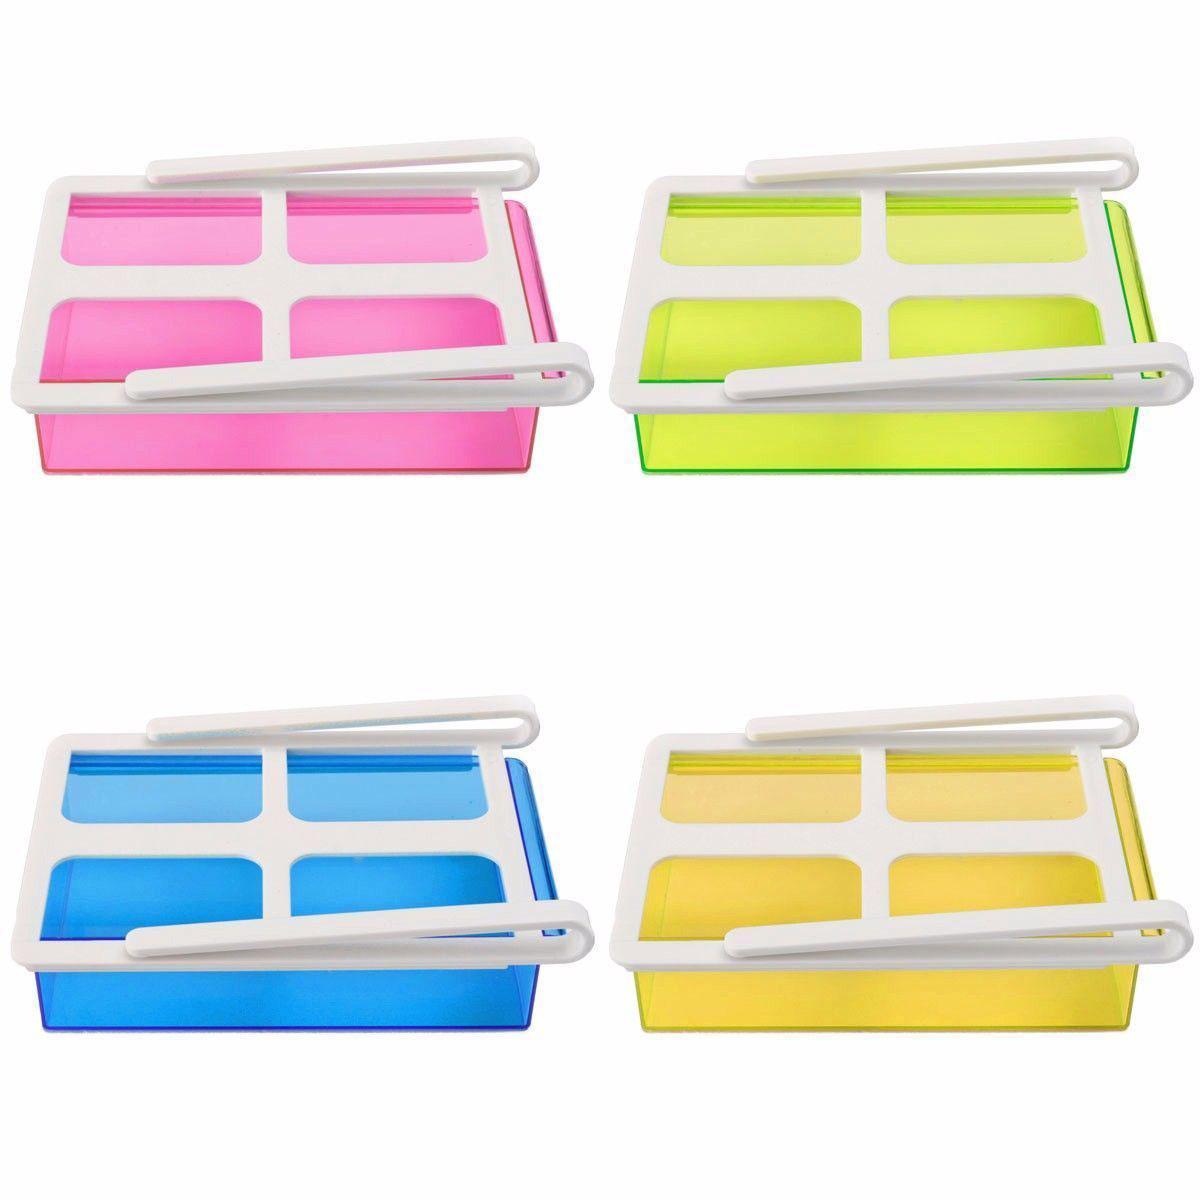 Slide Fridge Freezer Organizer Refrigerator Storage Rack Shelf Drawer 4Color(China (Mainland))